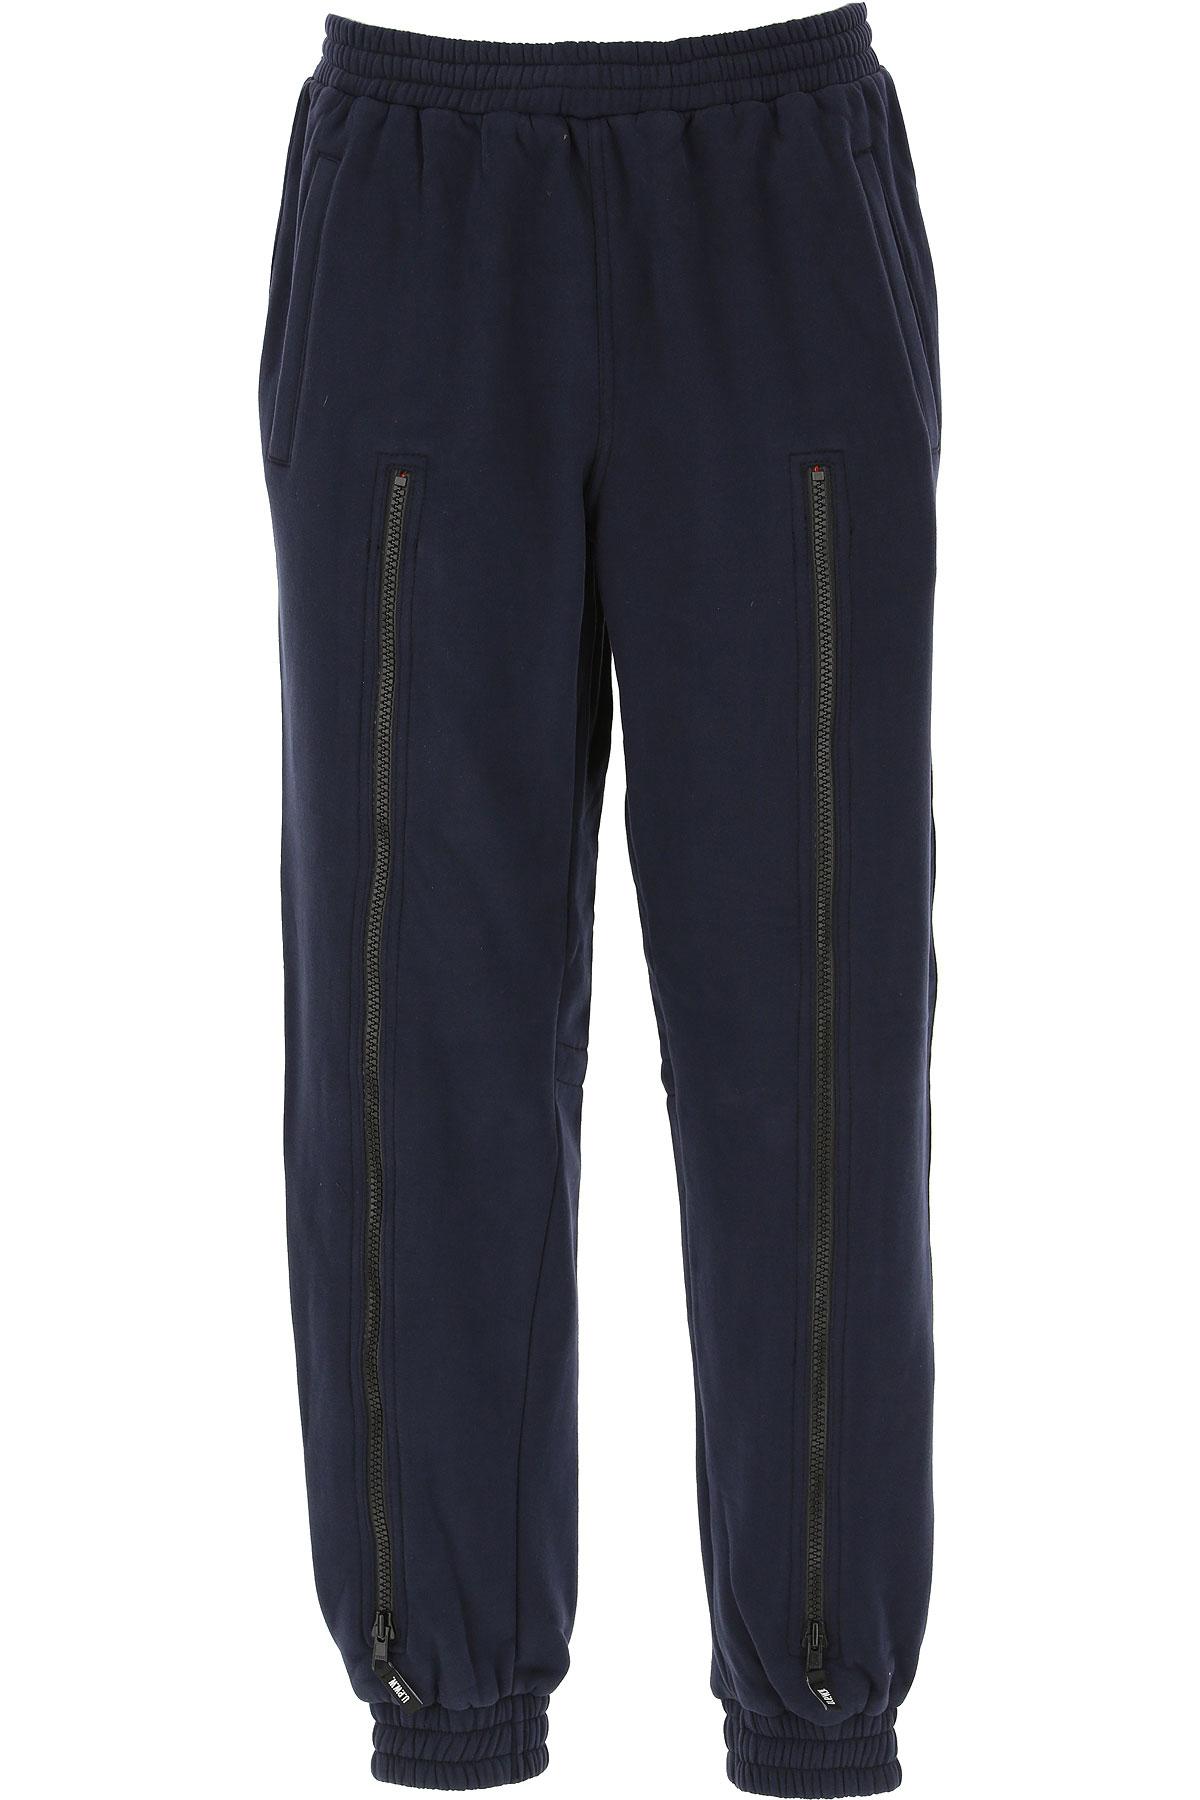 U.P.W.W. Mens Clothing, Blue, Cotton, 2019, 30 32 34 36